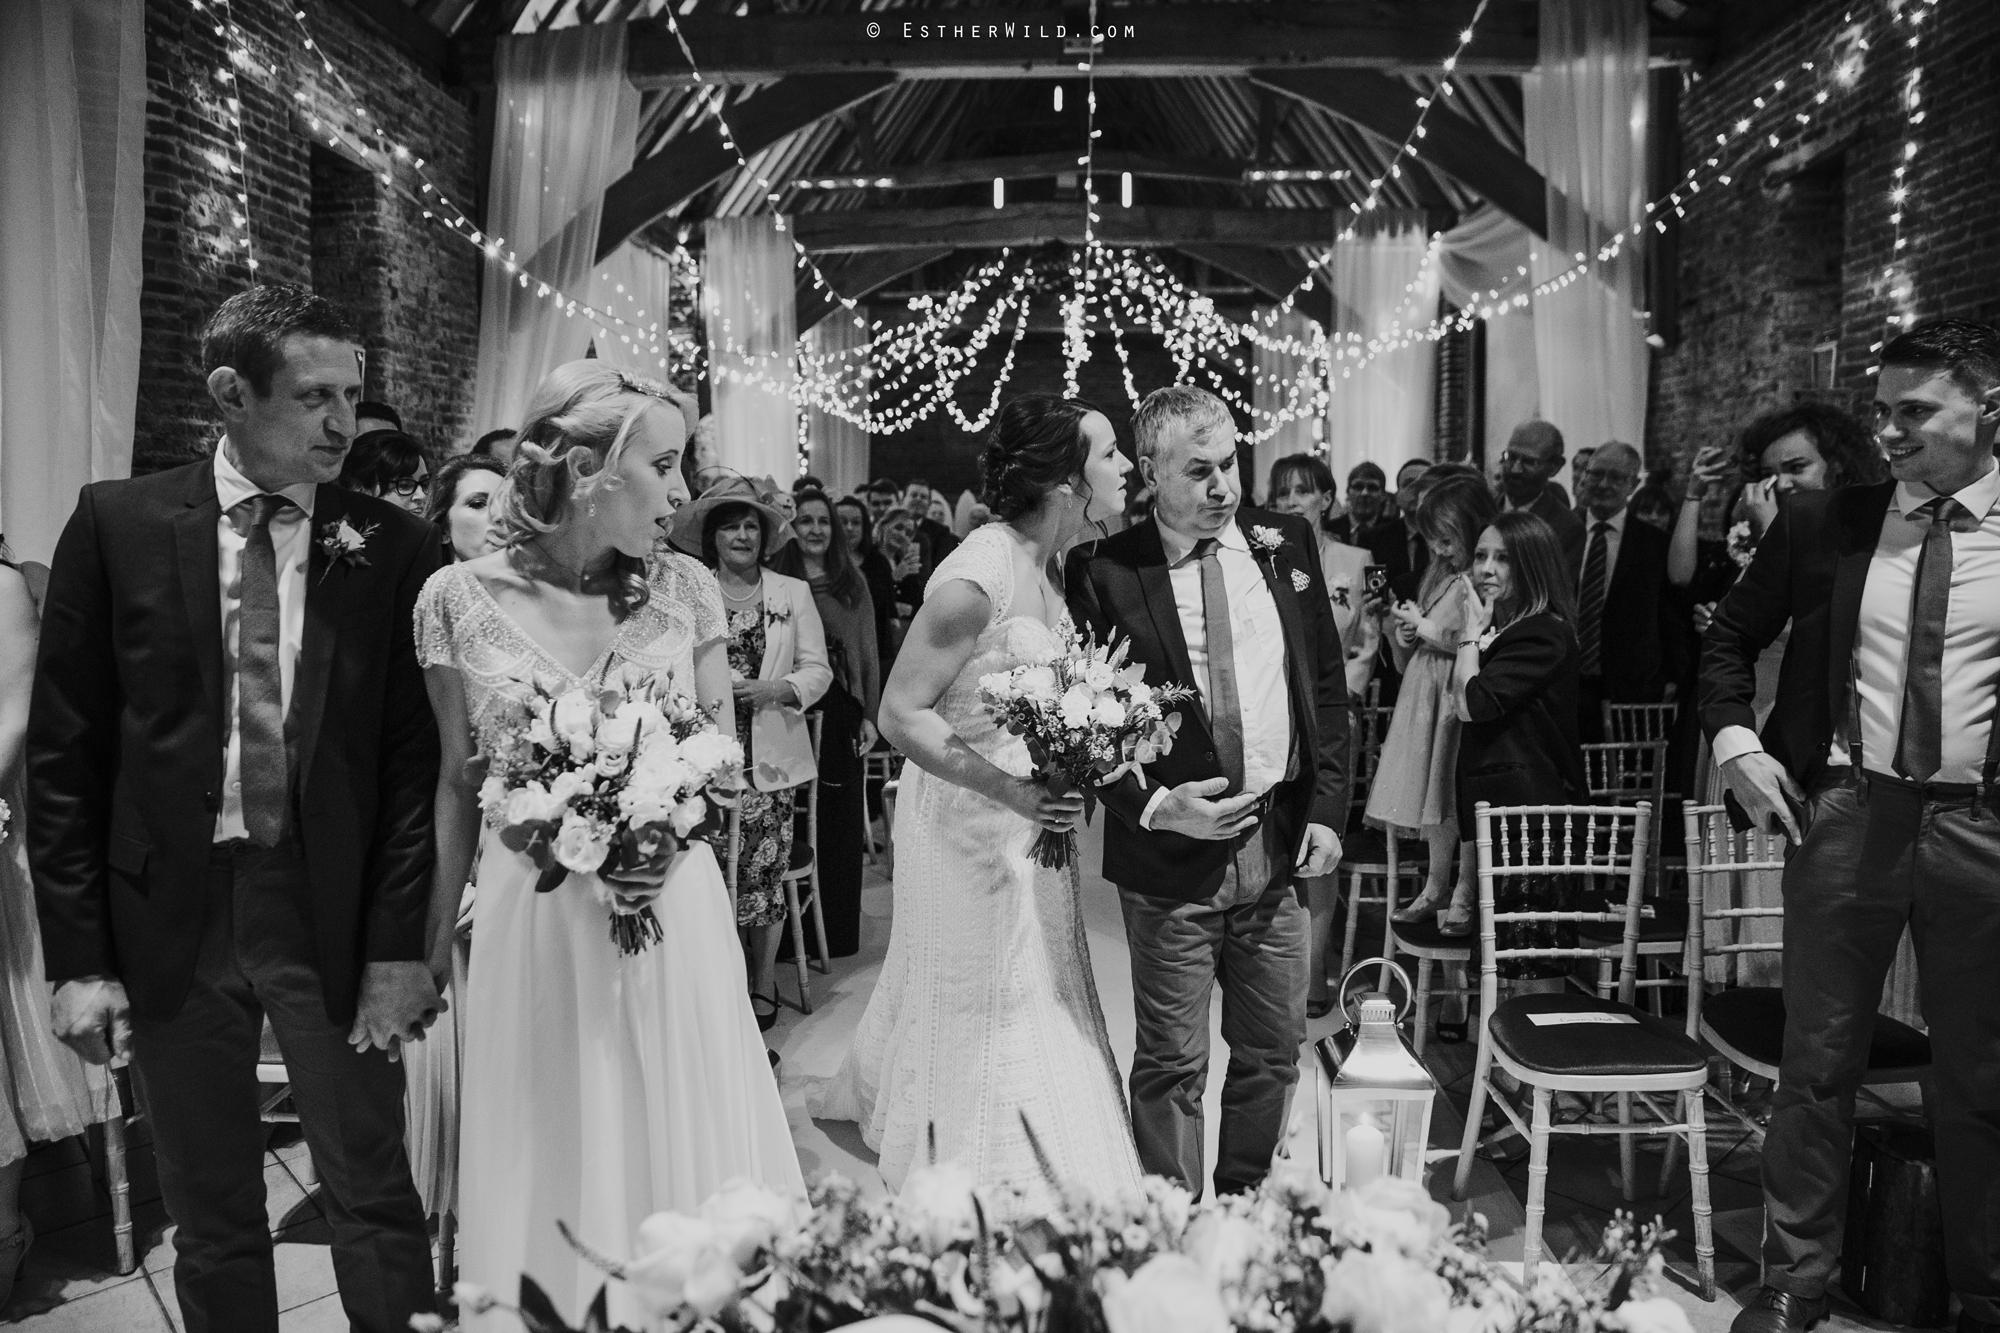 Elms_Barn_Weddings_Suffolk_Photographer_Copyright_Esther_Wild_IMG_1130-2.jpg